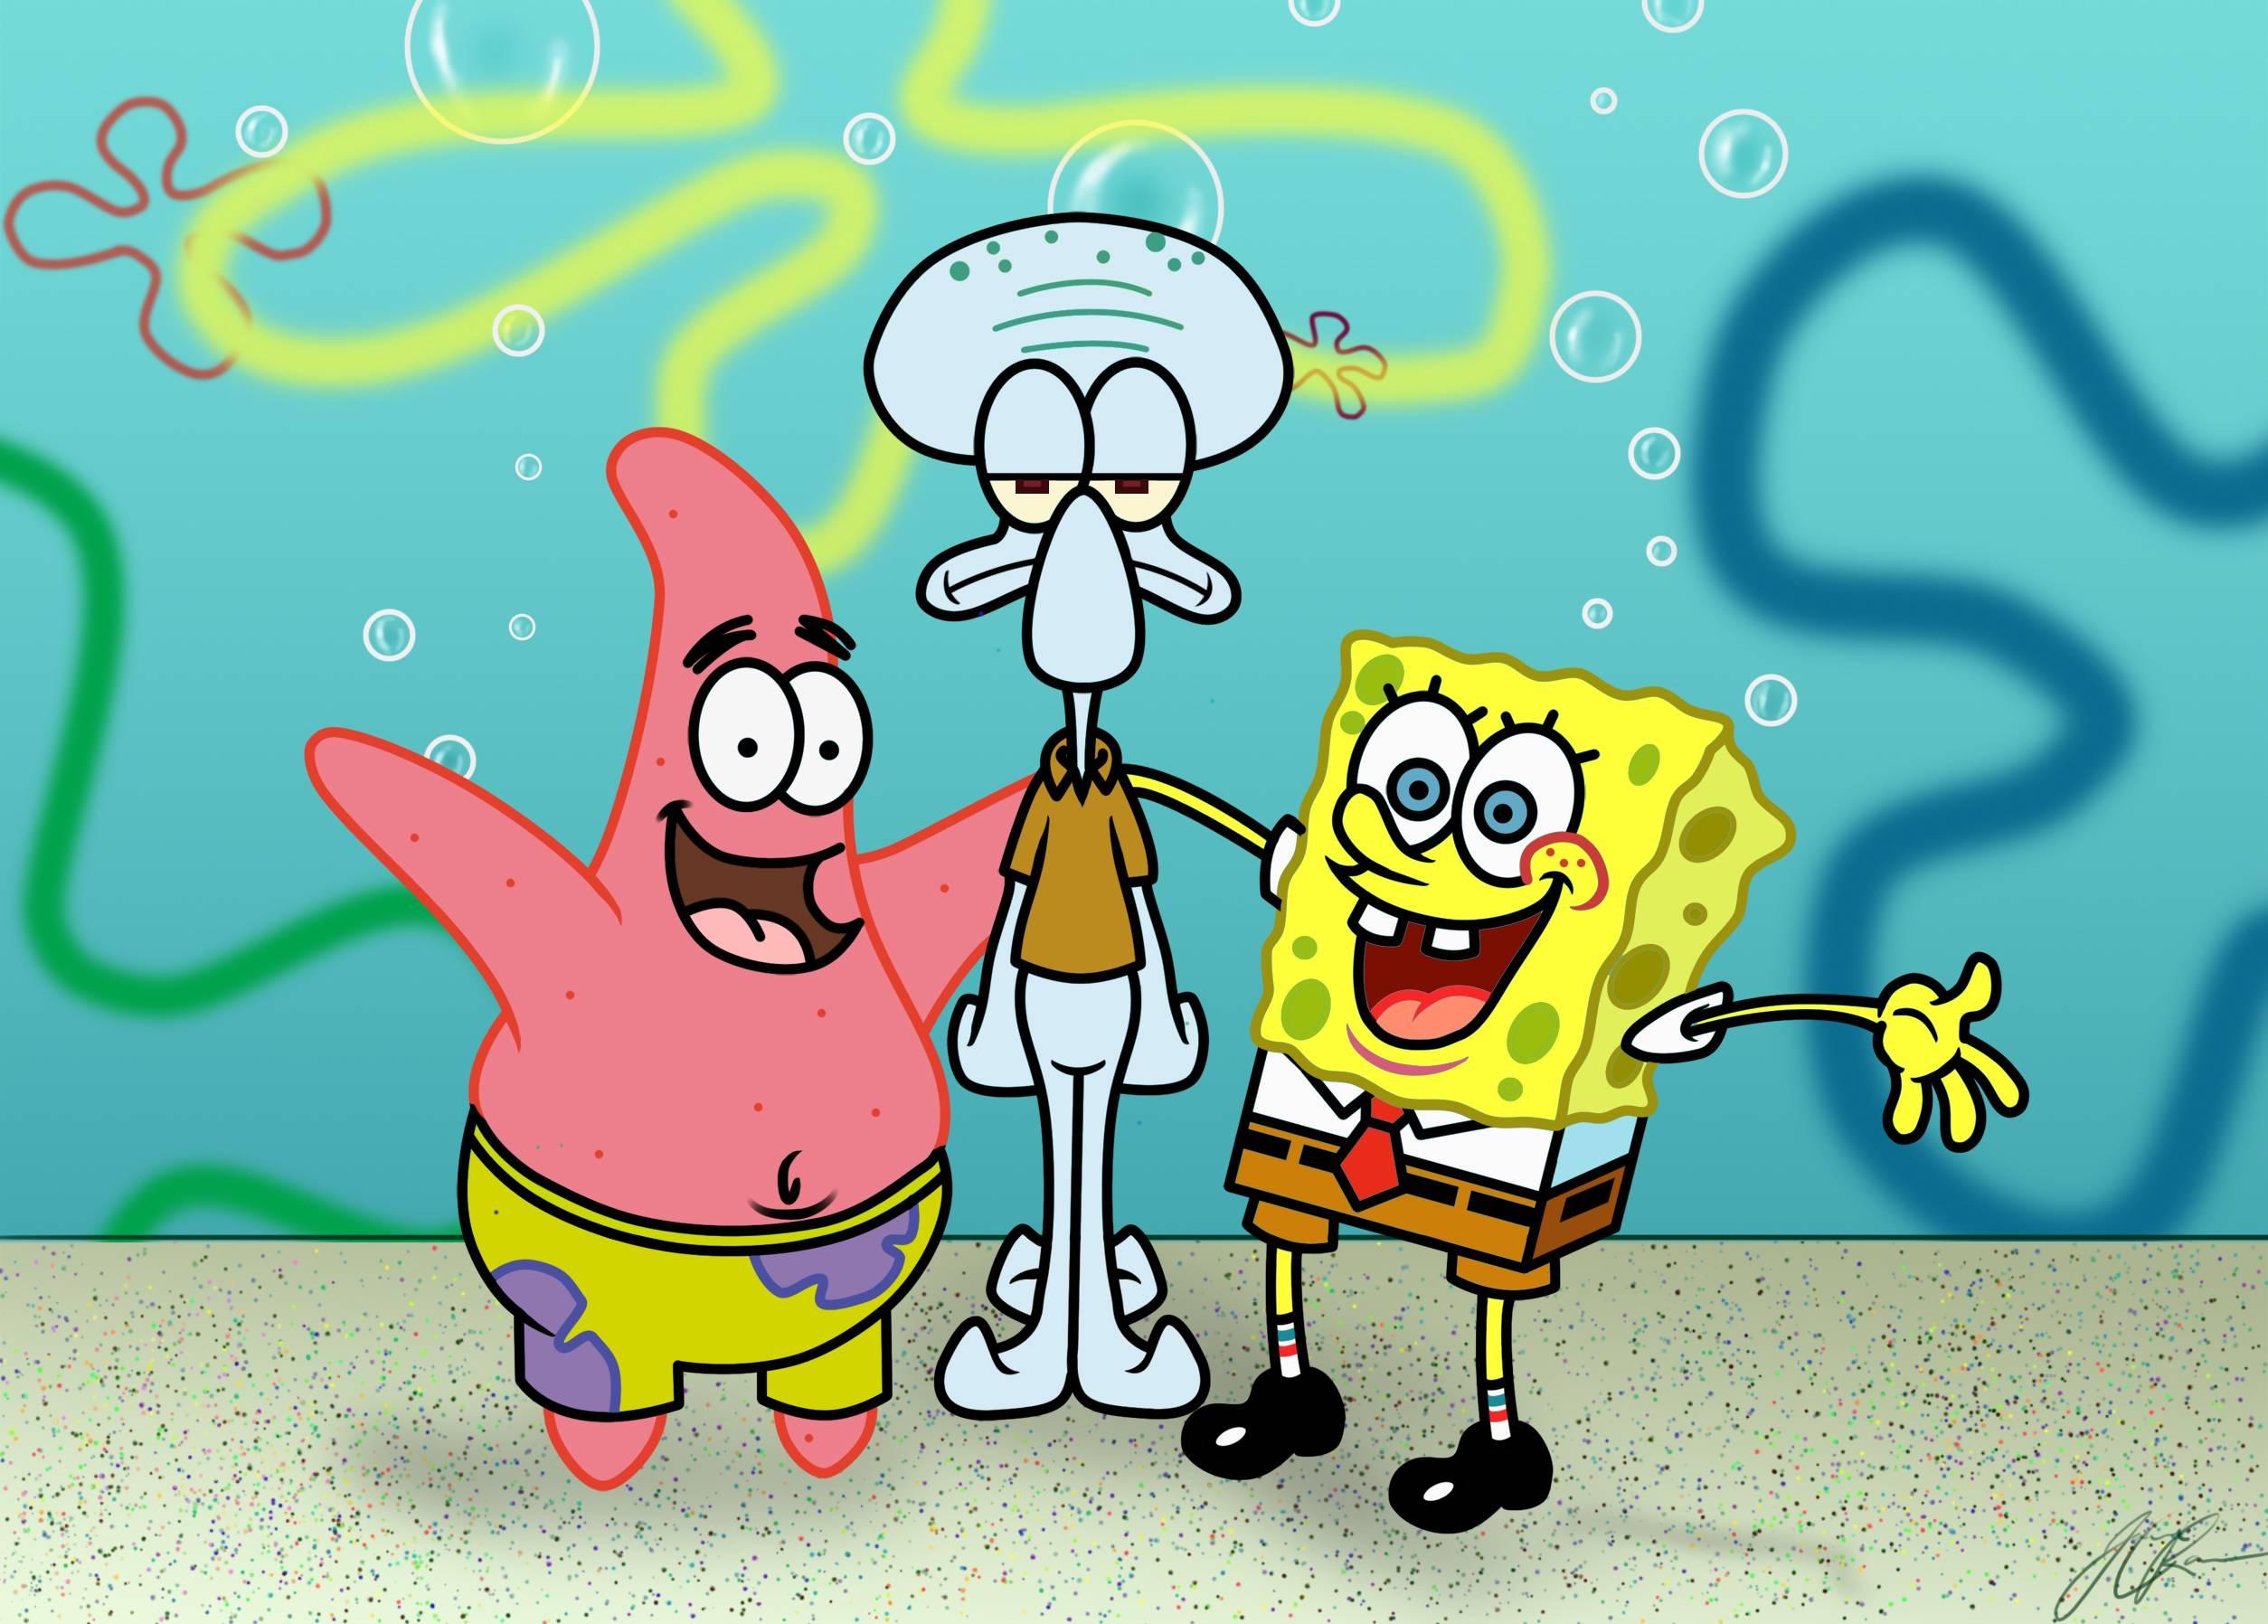 spongebob squarepants wallpaper for android